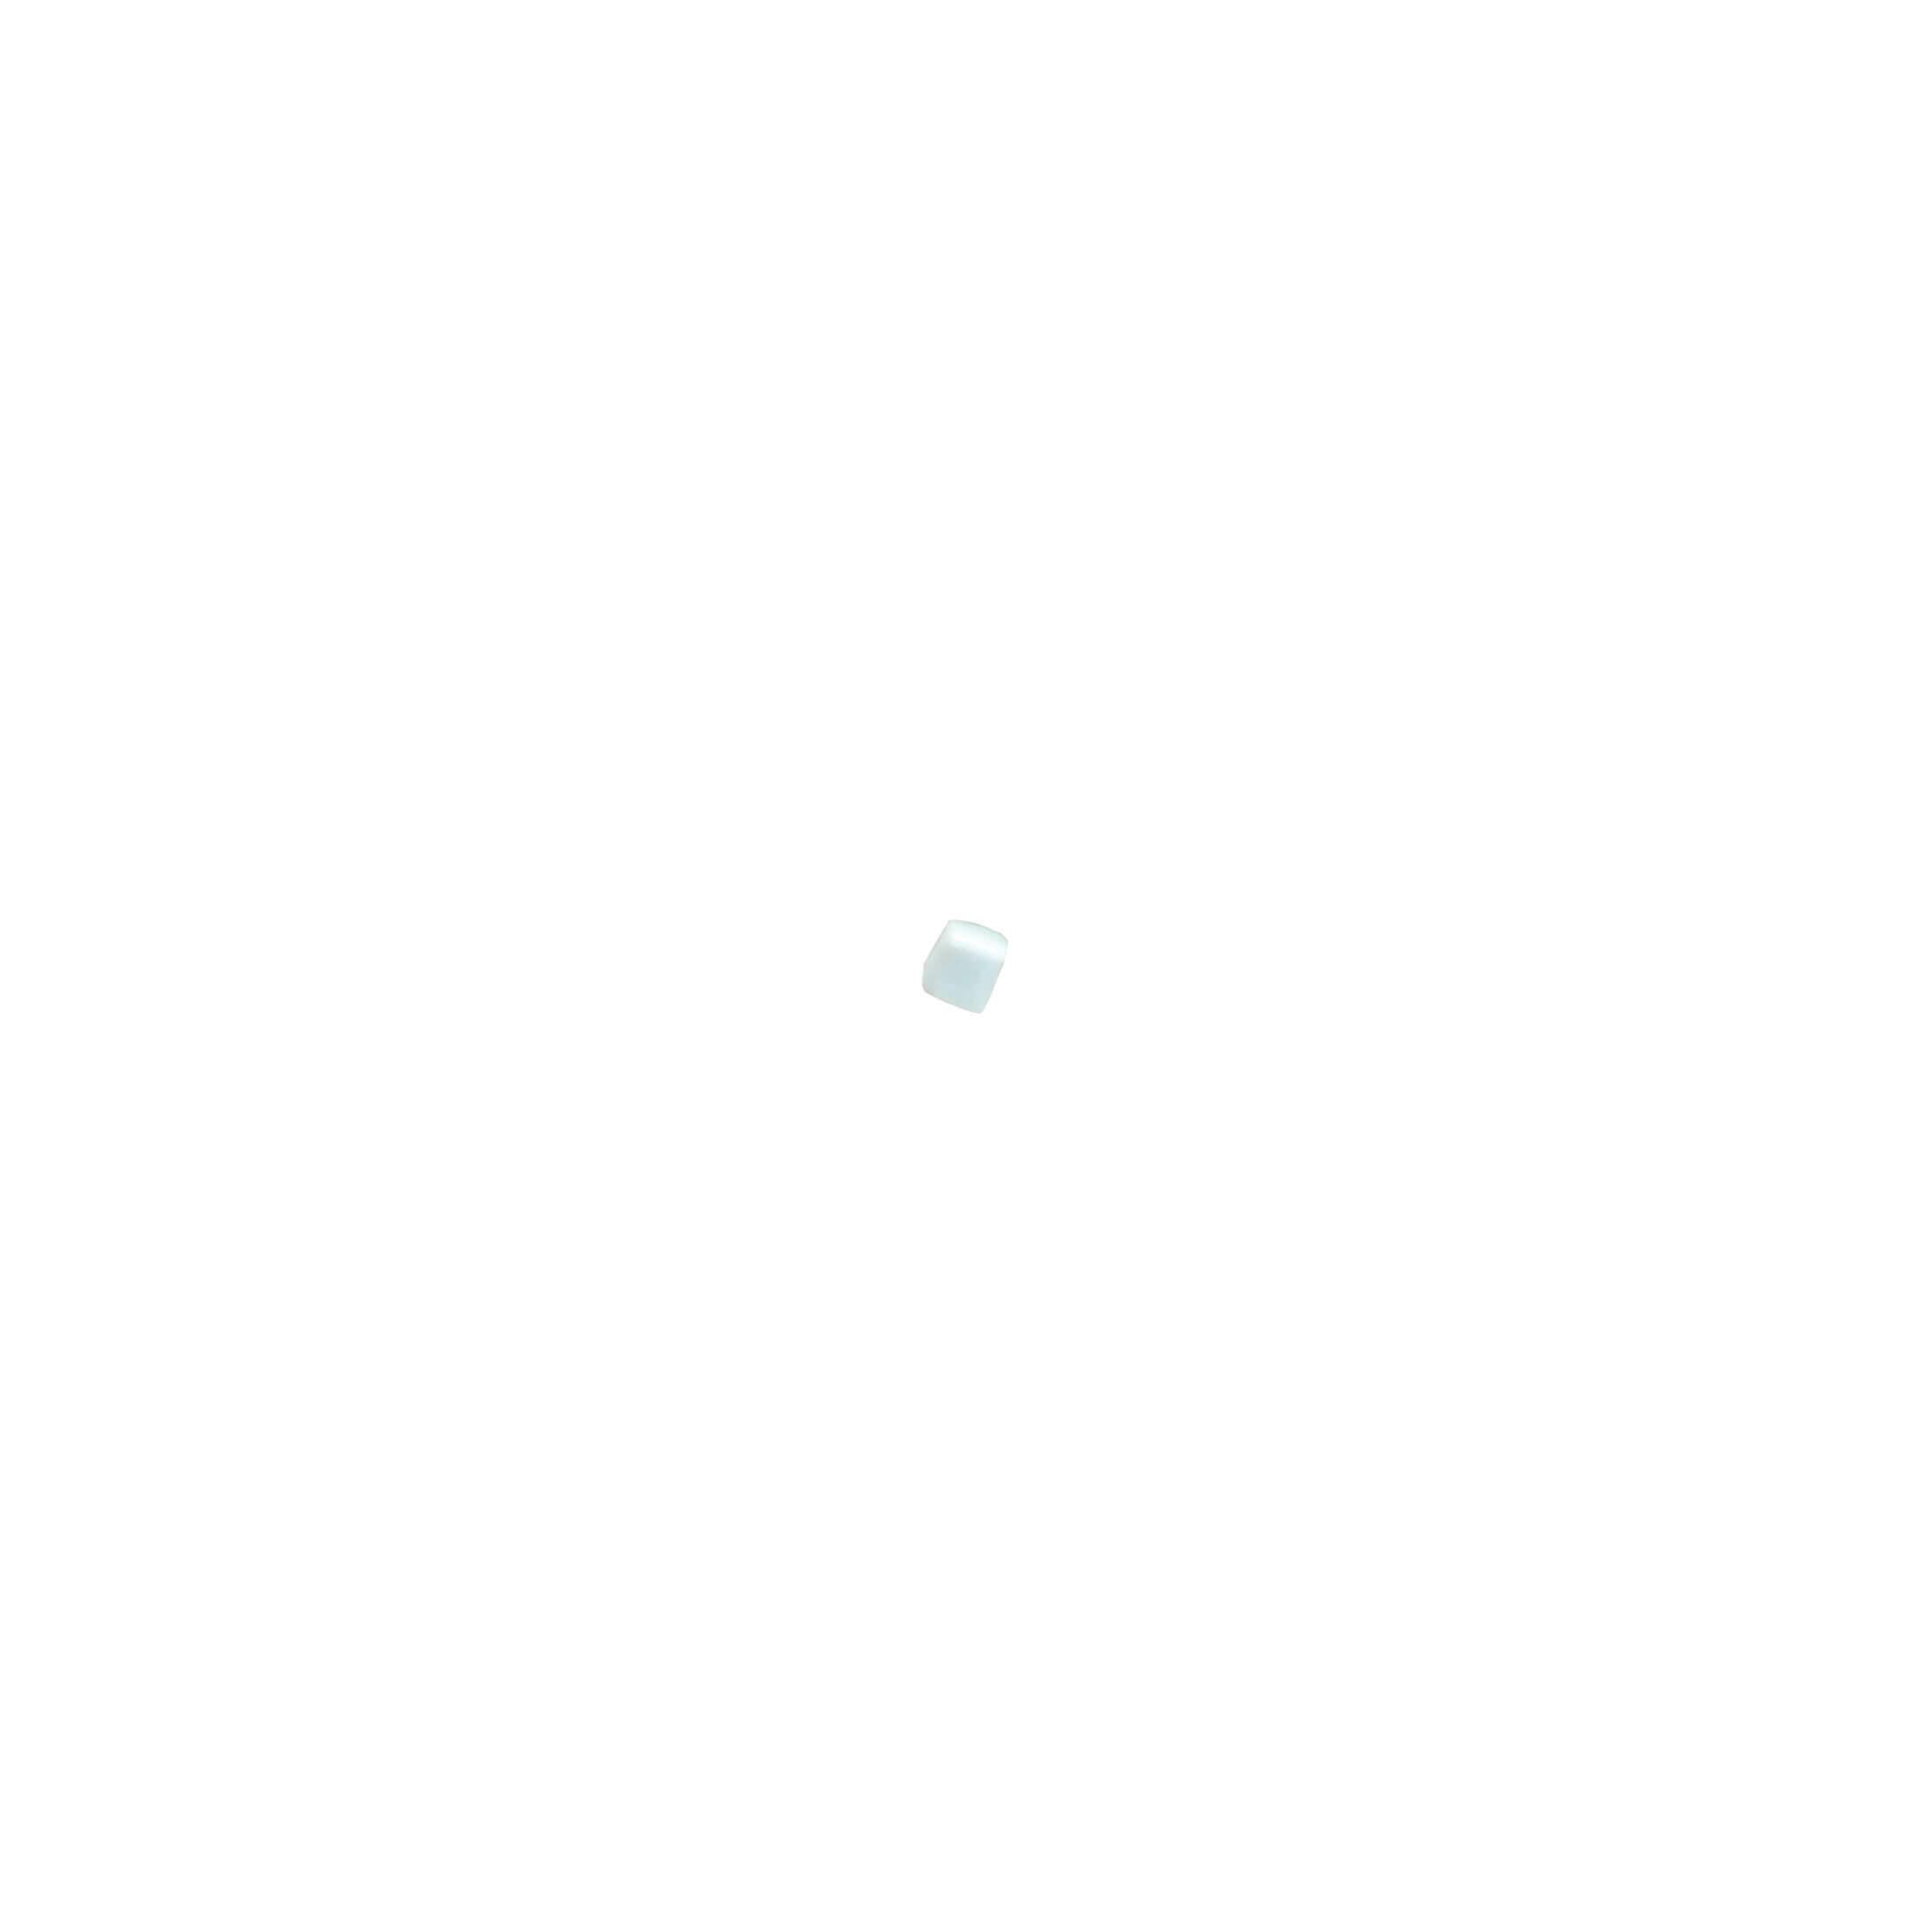 ADST5261 - ANGULO BULLNOSE TRIM